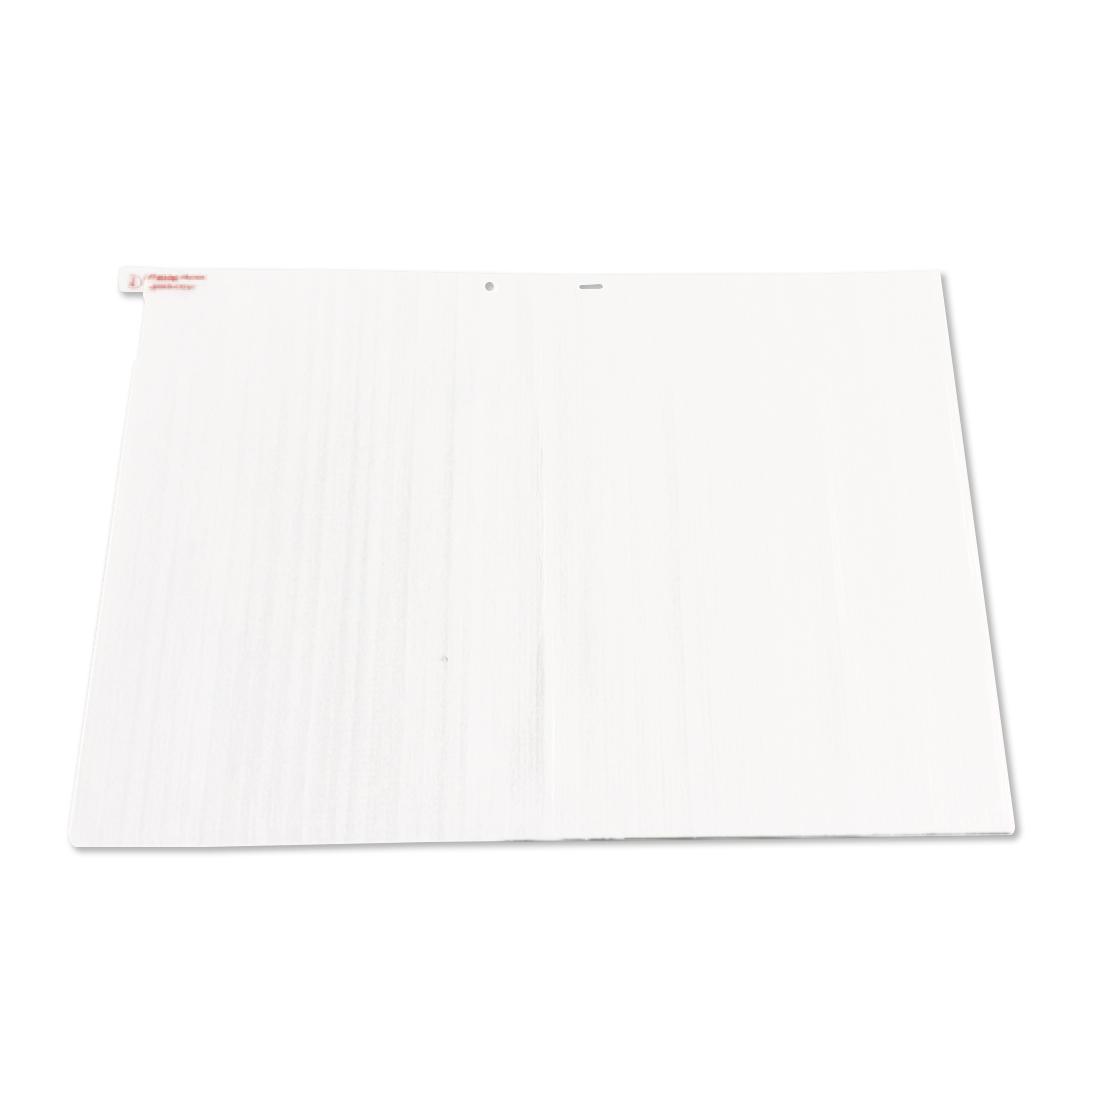 5X-Protector-de-vidrio-templado-de-vidrio-templado-para-Microsoft-Surface-P-S3G1